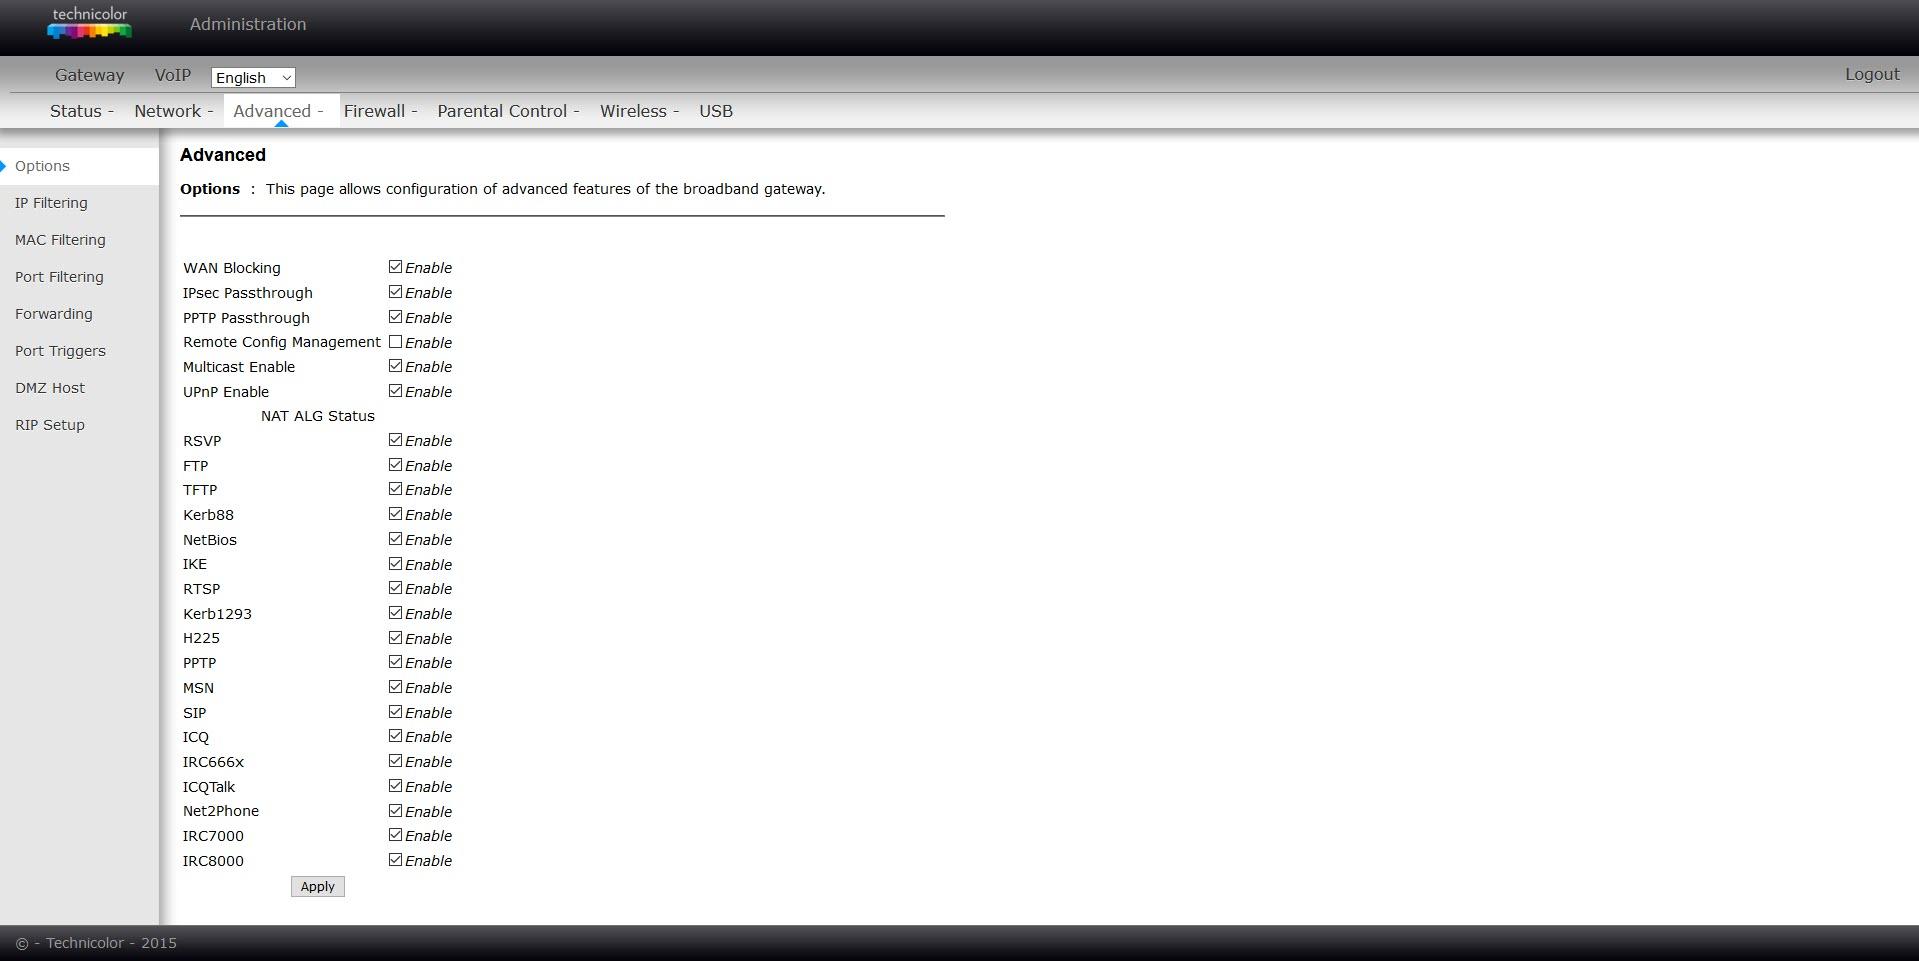 I cannot change my Strict NAT type on my PC 3dde412e-1d4c-41b6-a9ec-f10b676154aa?upload=true.jpg